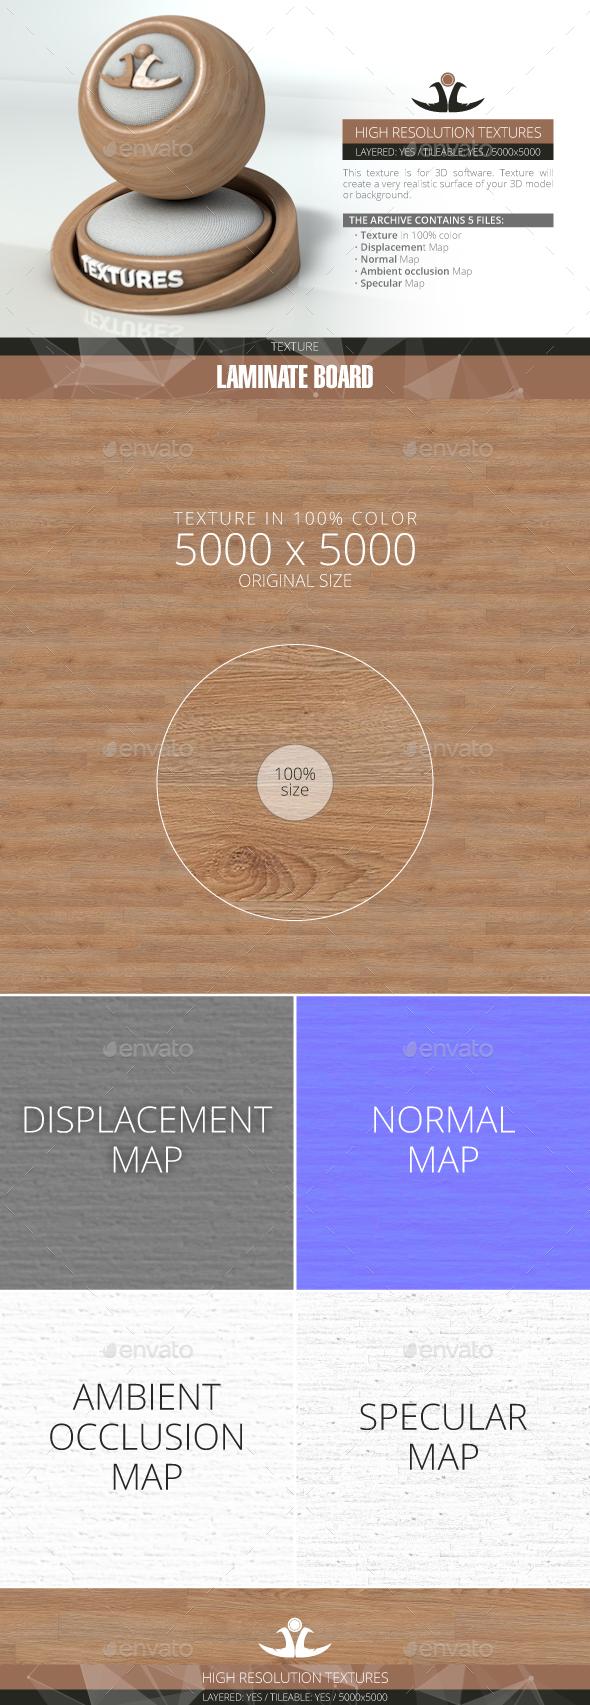 Laminate Board 73 - 3DOcean Item for Sale